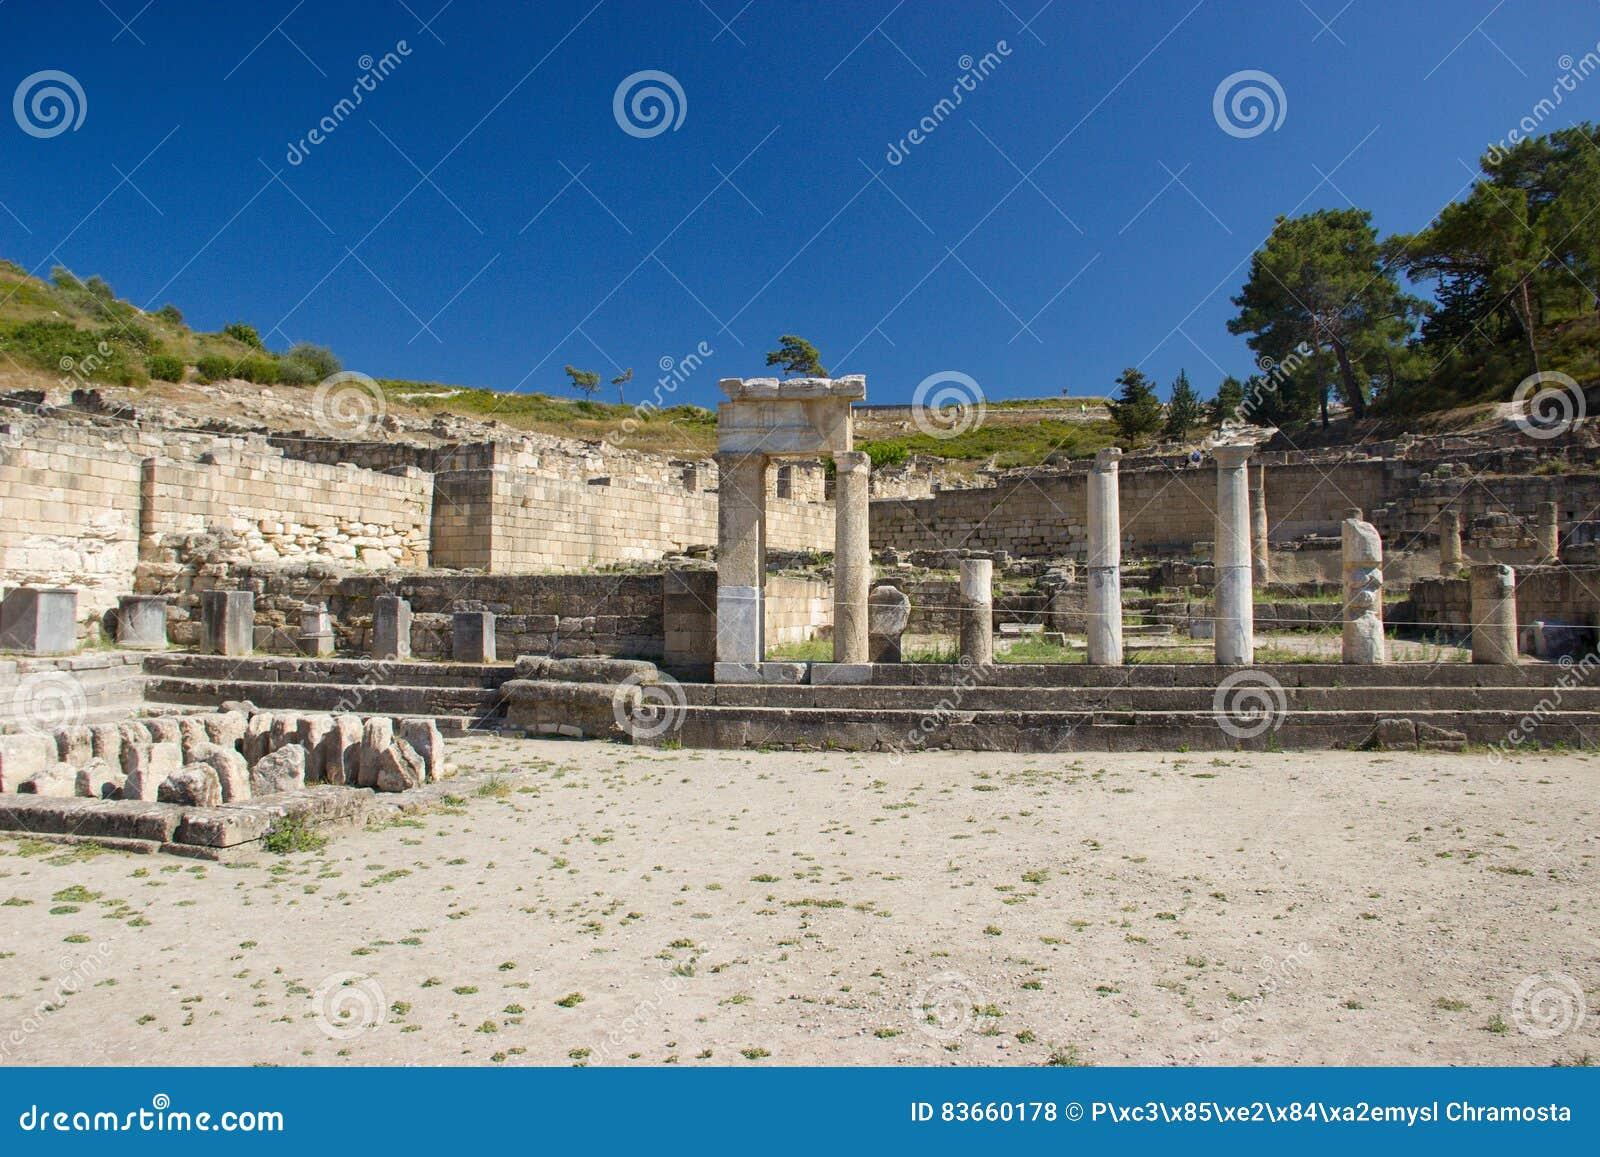 Arquitectura antigua de Kamiros Rhodos Grecia histórica